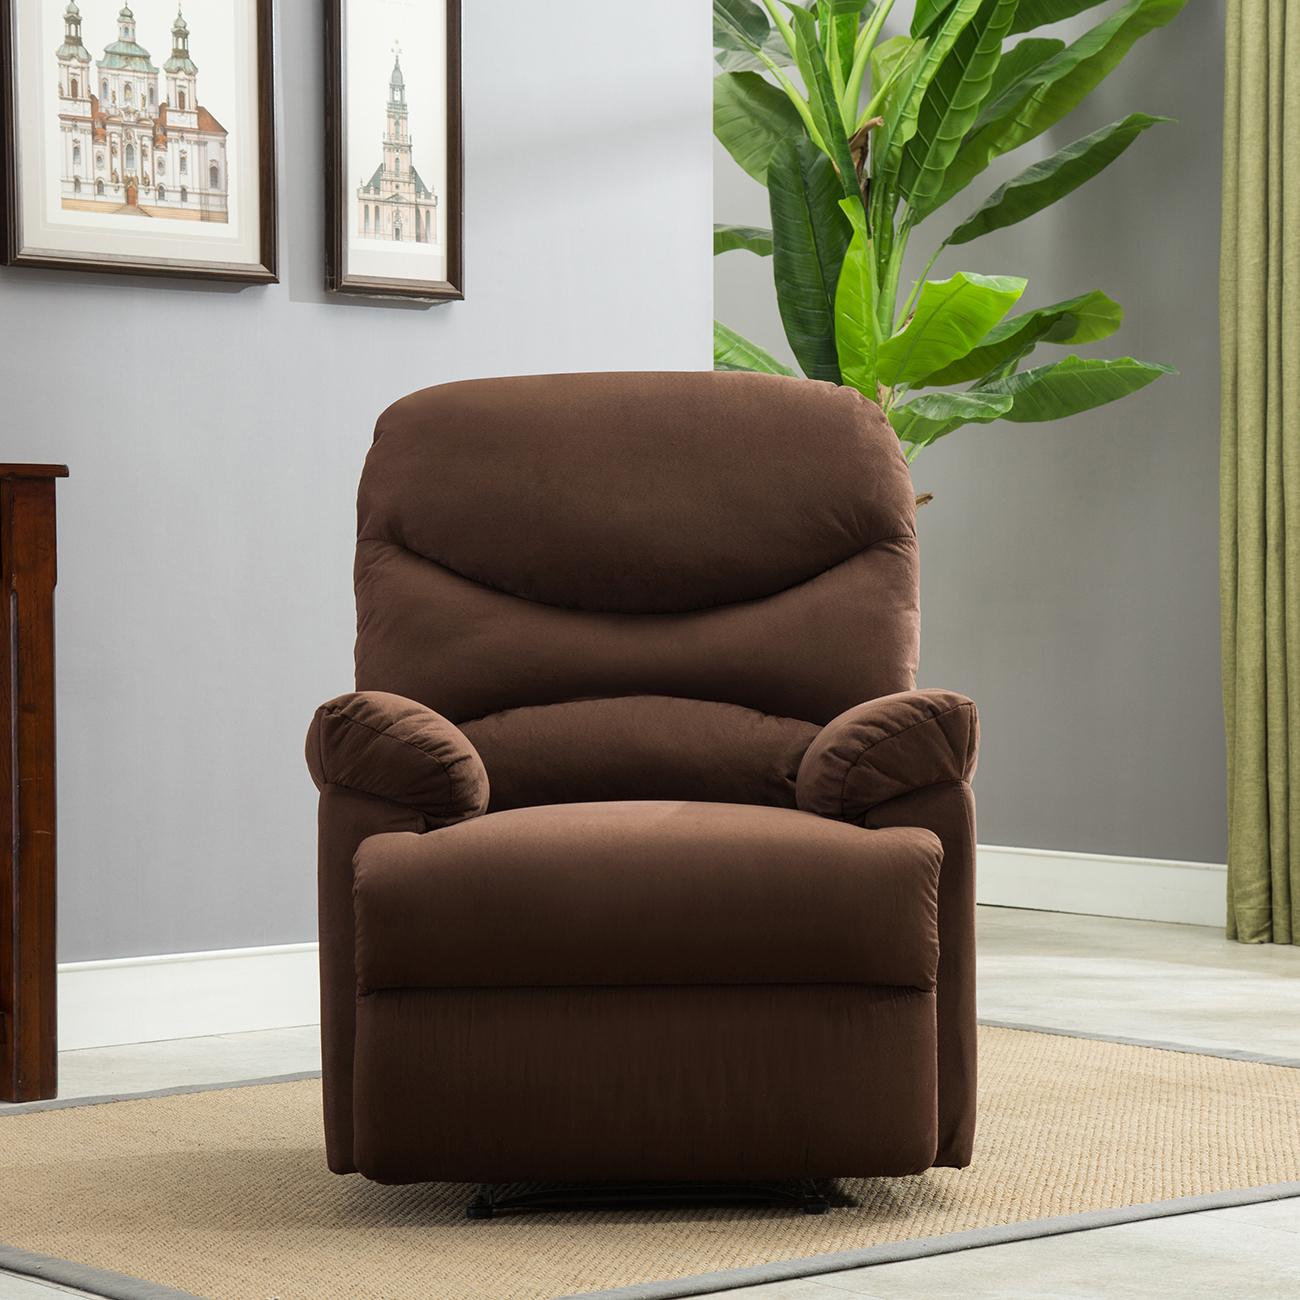 Plush Recliner Livingroom Reclining Chair Man Cave TV